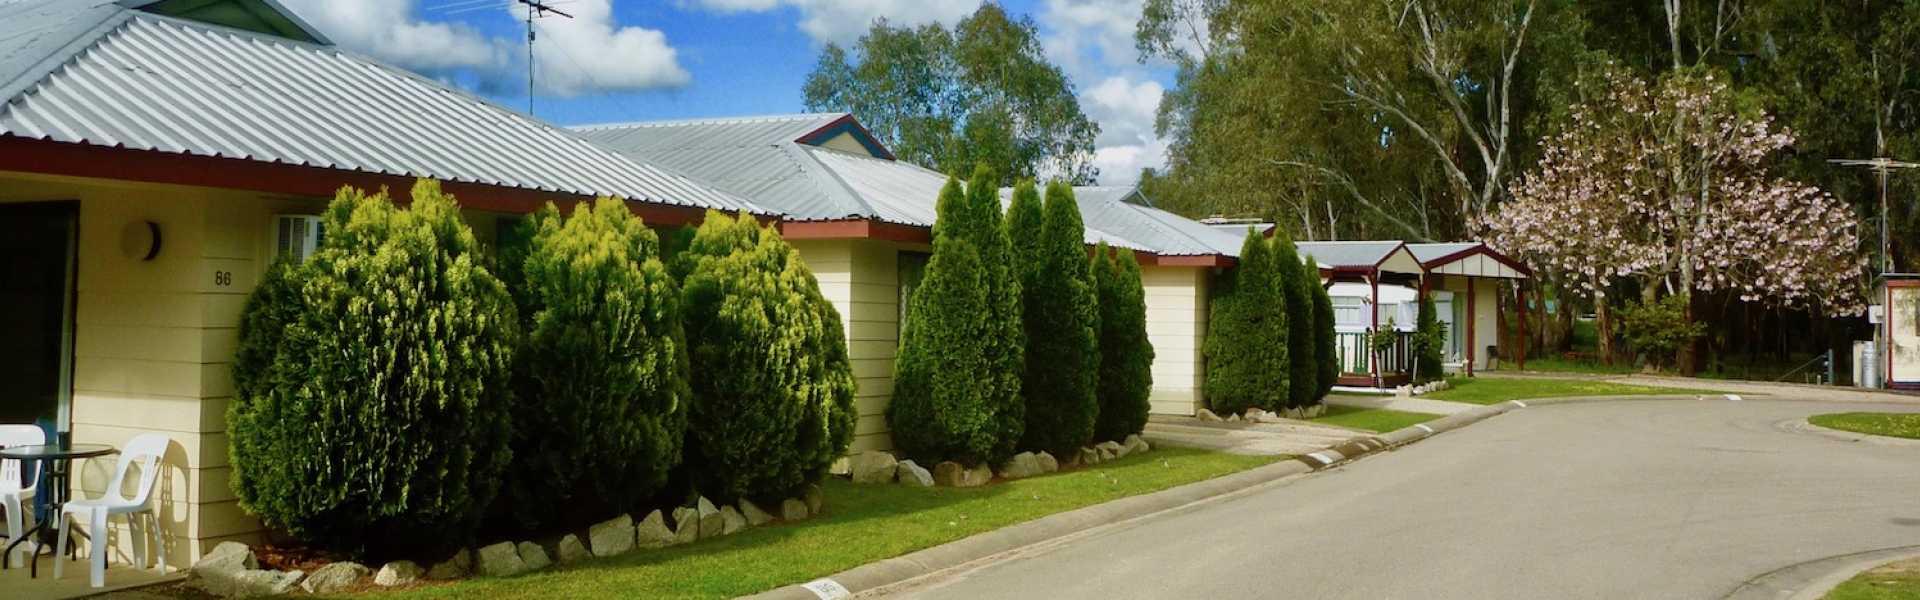 Kui Parks, Wangaratta Caravan Park, Cabins